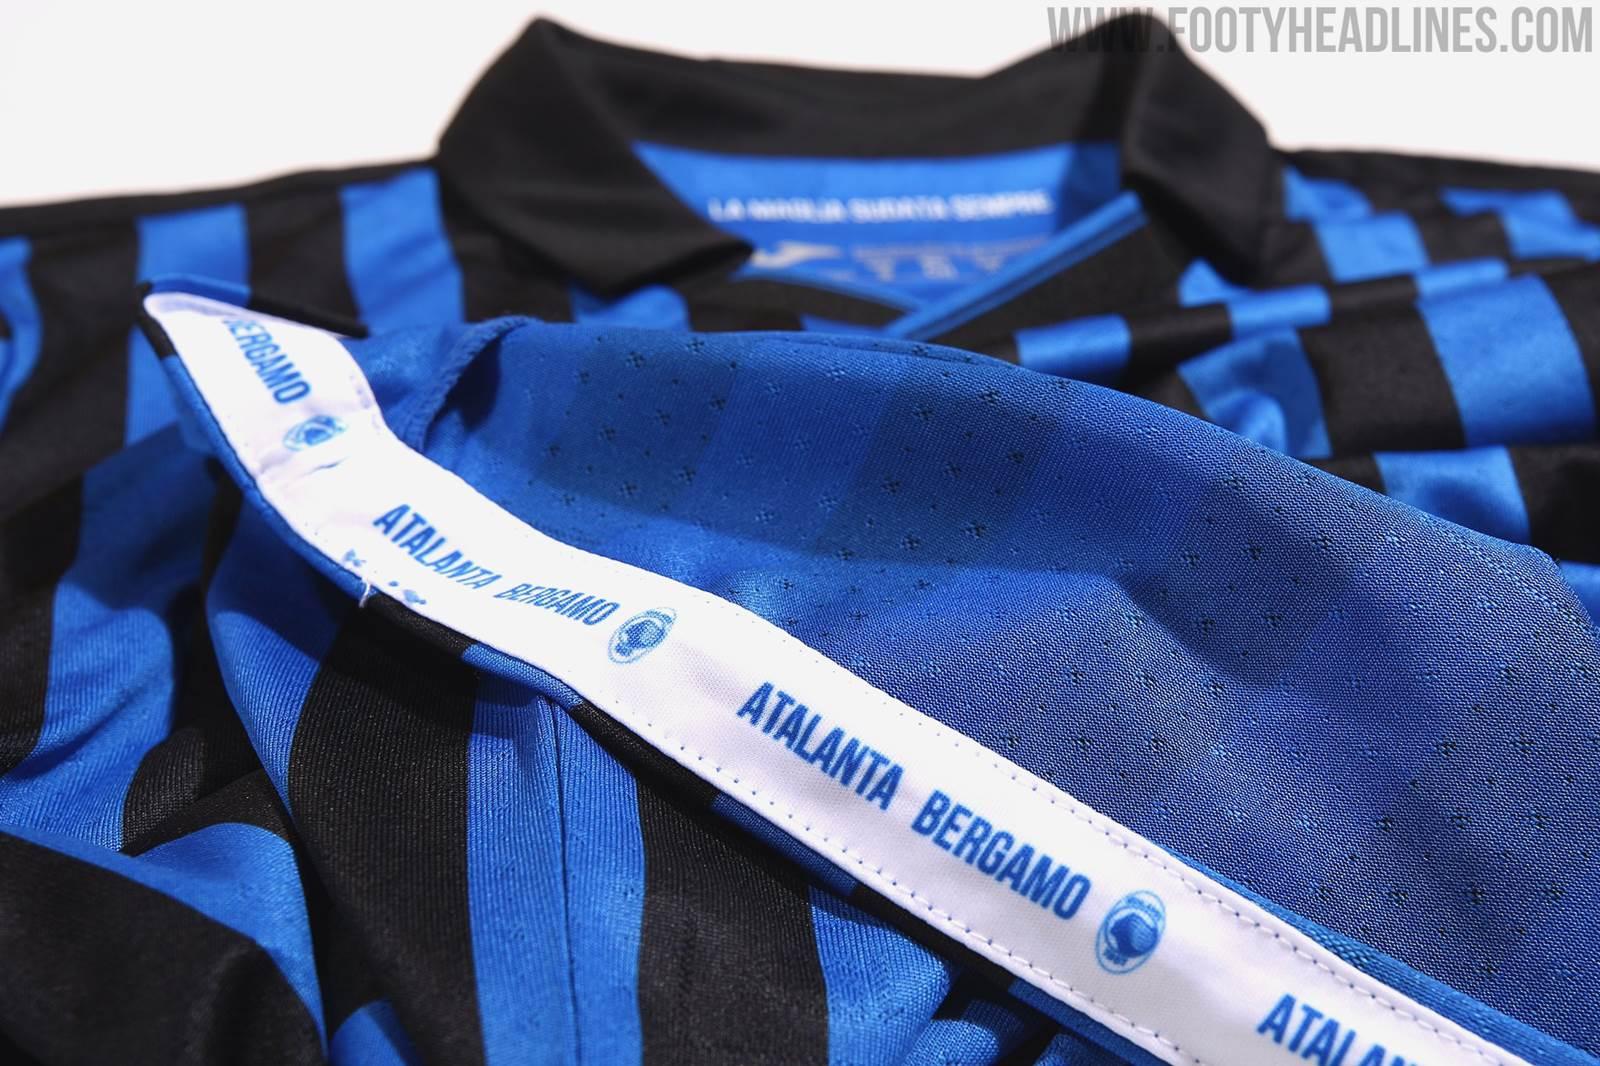 Atalanta 20-21 Champions League Trikot enthüllt - Nur Fussball